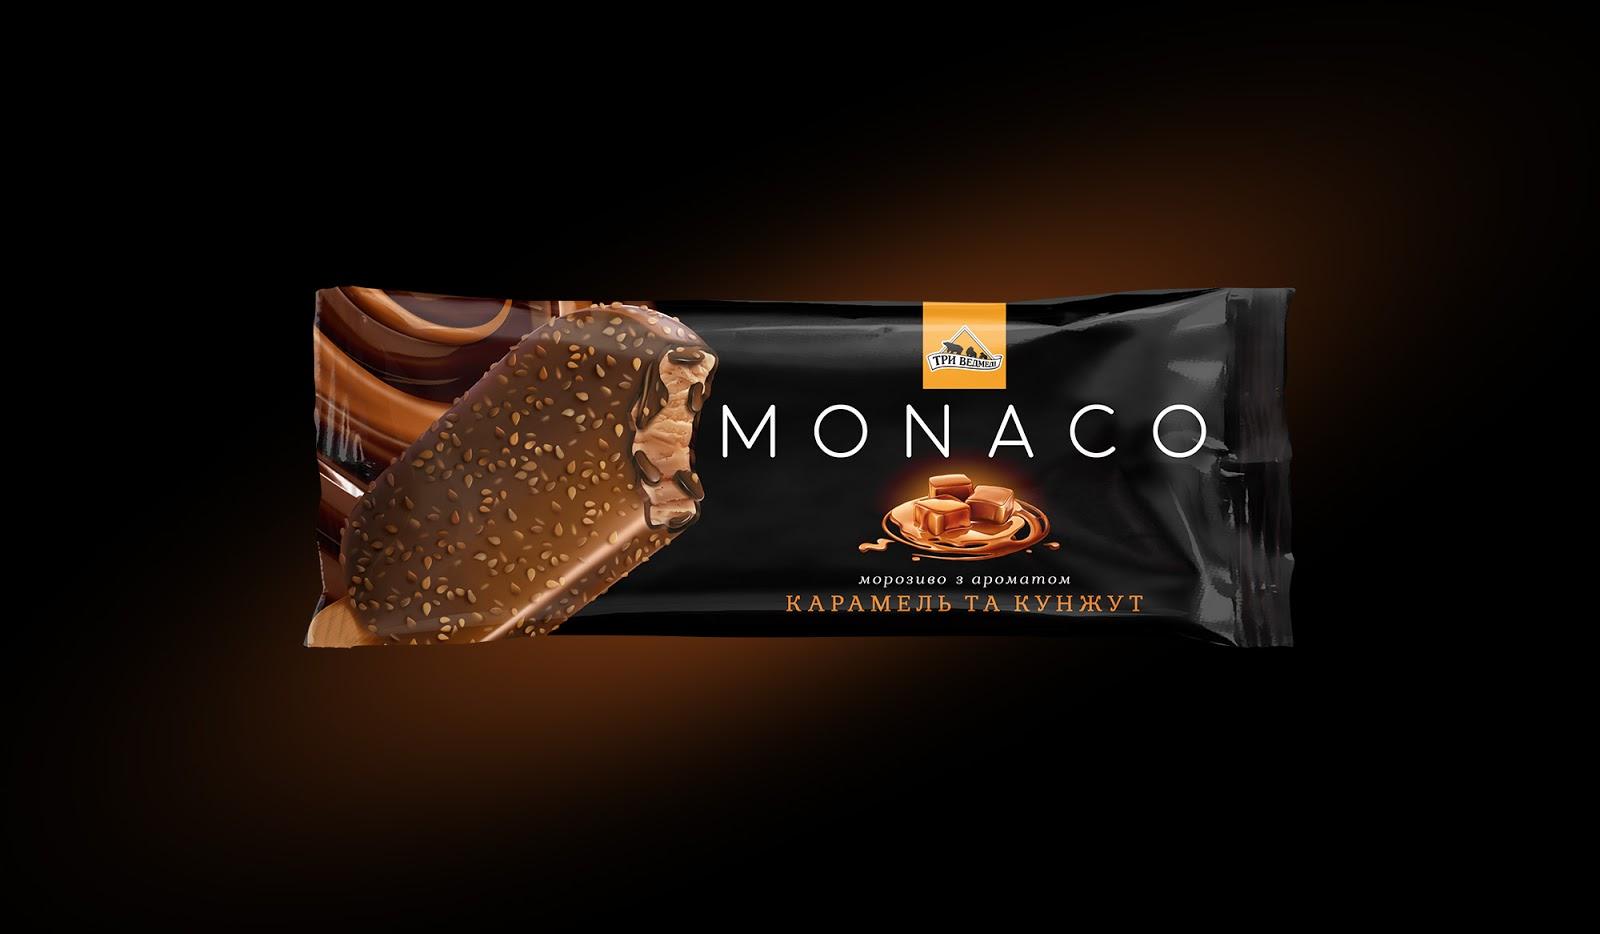 MONACO冰棒包装设计